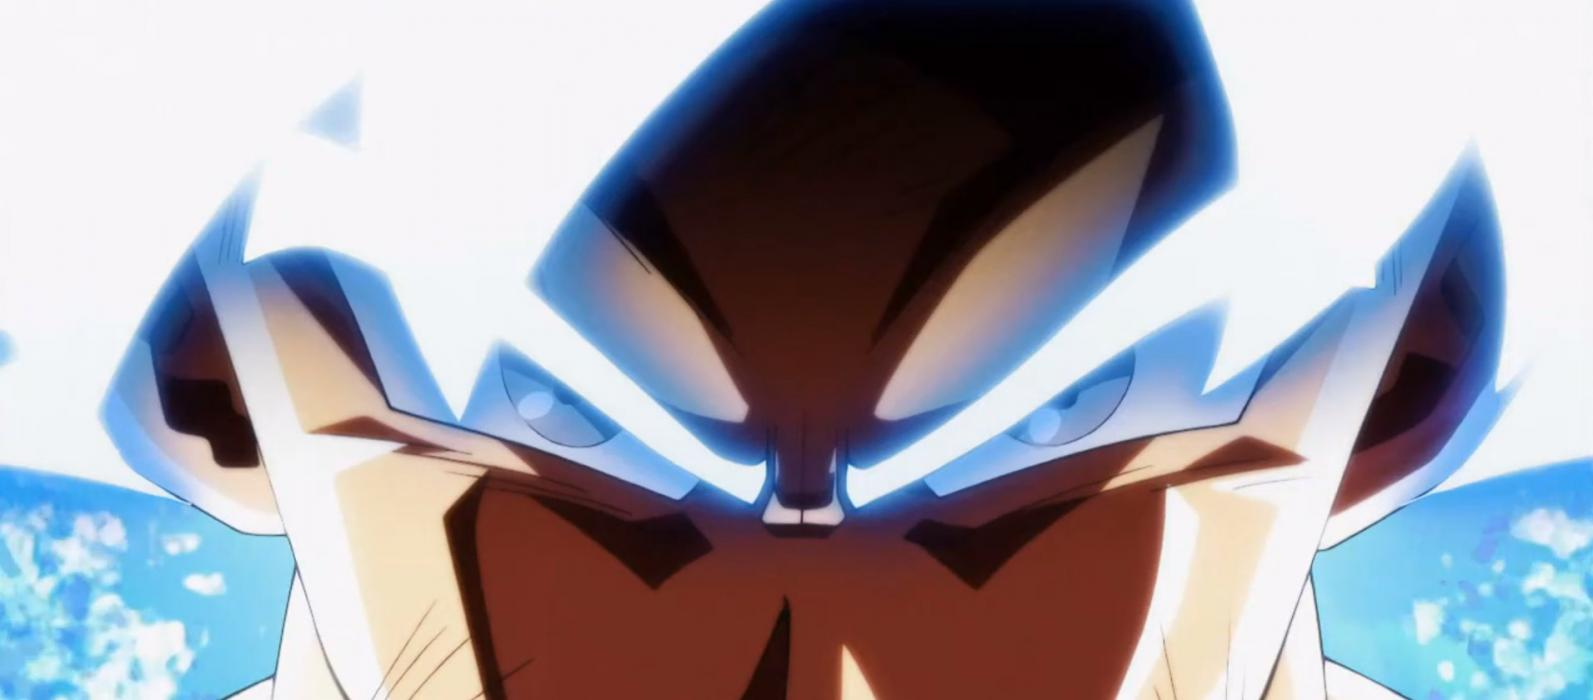 Dragon Ball Akira Toriyama Y La Ley Del Minimo Esfuerzo